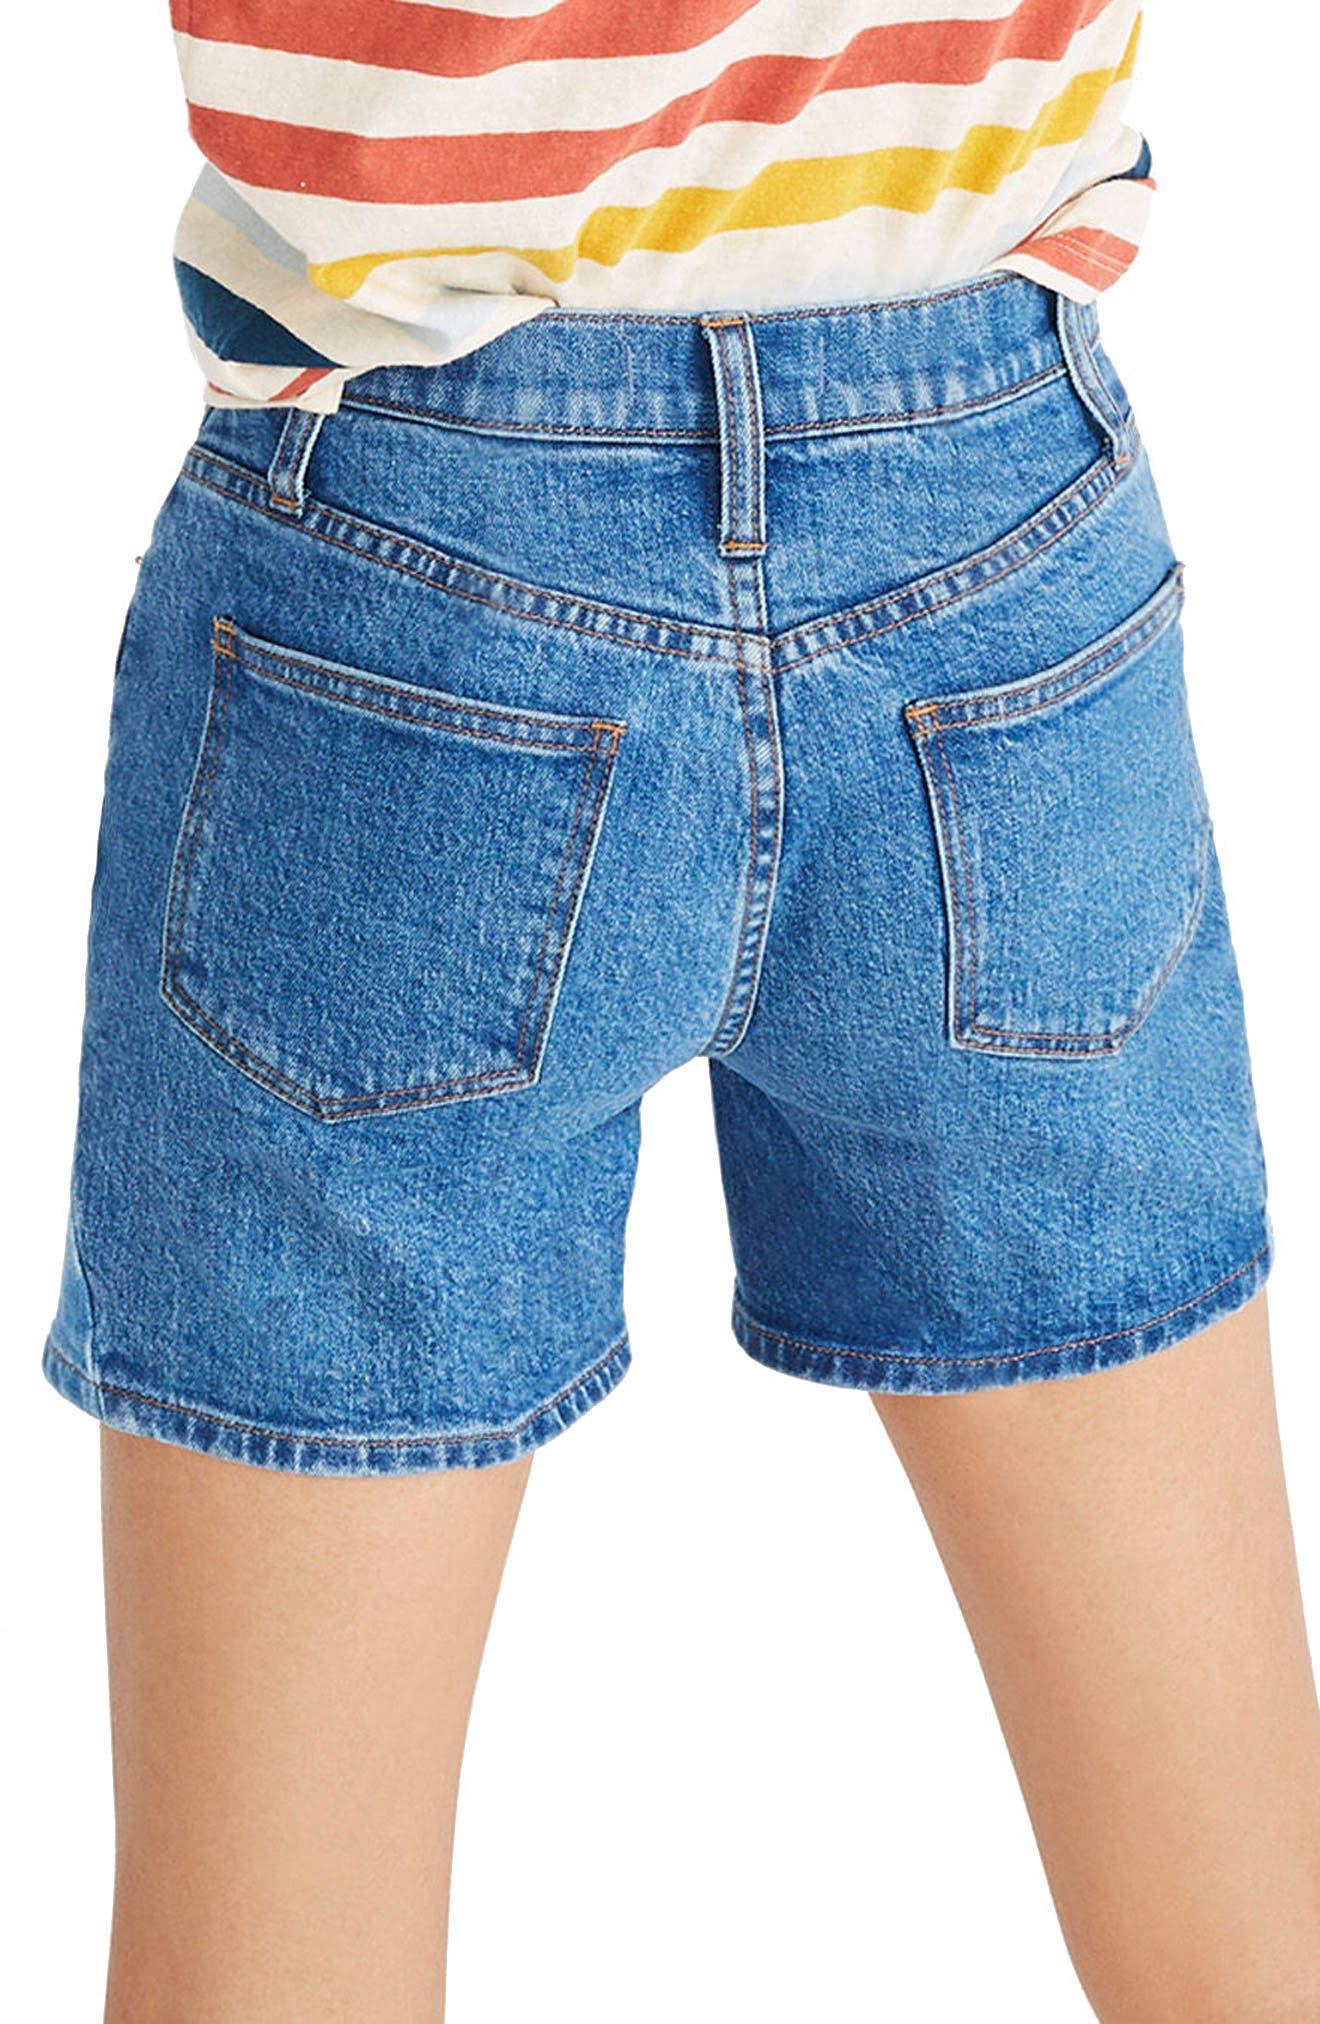 High Waist Pieced Denim Shorts,                             Alternate thumbnail 2, color,                             Wylie